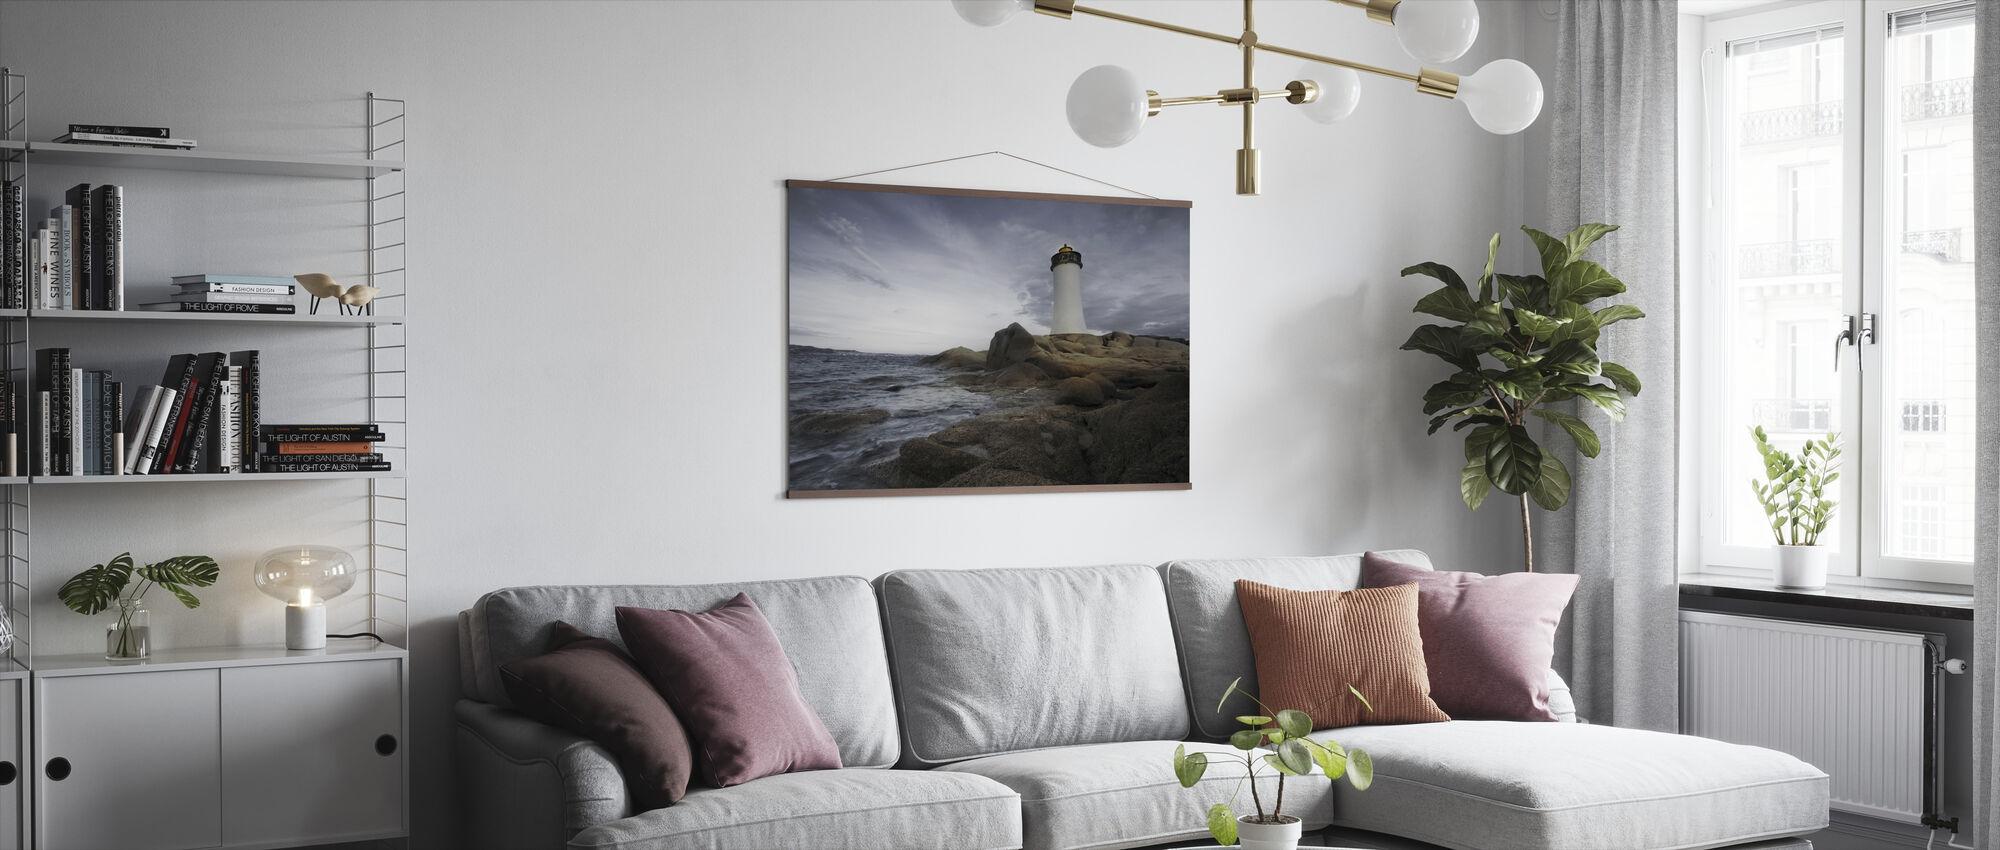 Sardinia Fyr - Plakat - Stue